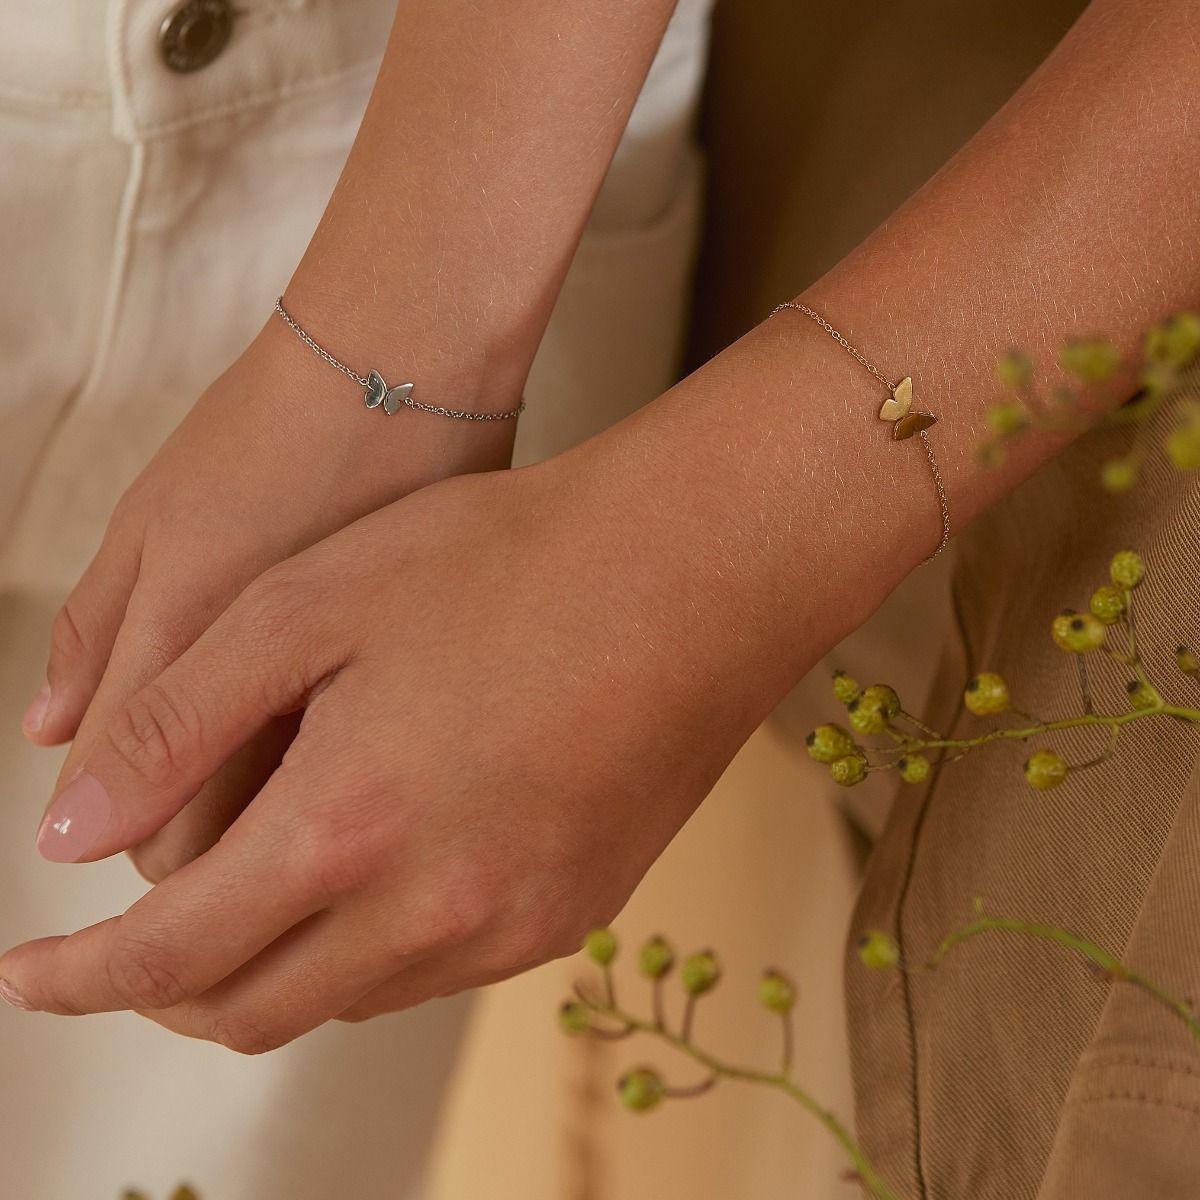 edblad-su21-papillon-bracelet-gold-bracelet-child-steel-0138-kv_1